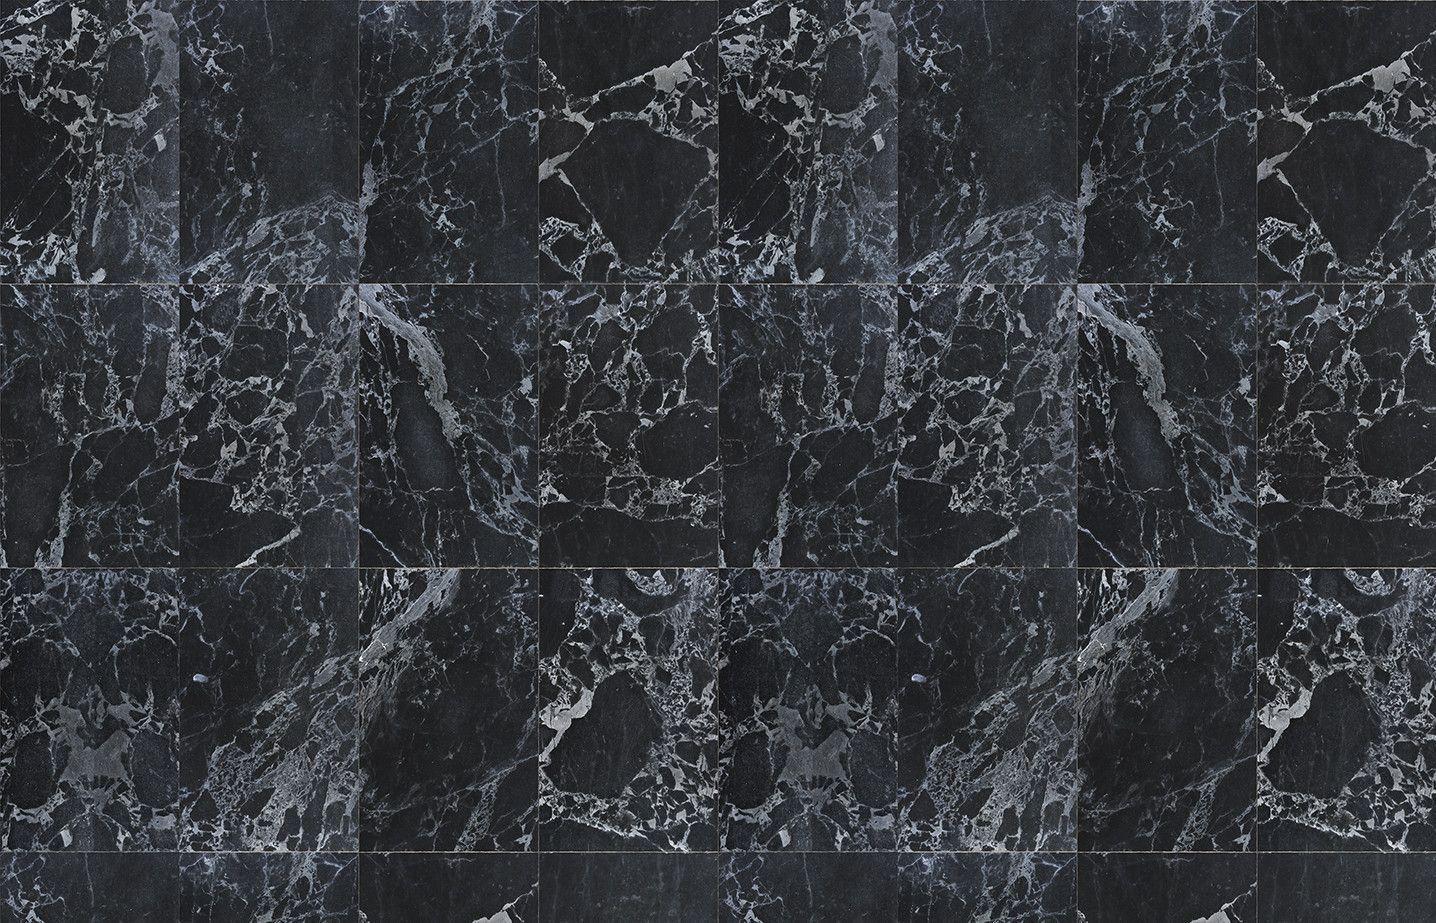 Black Marble Wallpaper Design By Piet Hein Eek For Nlxl Wallpaper Marble Wallpaper Black Marble Piet Hein Eek